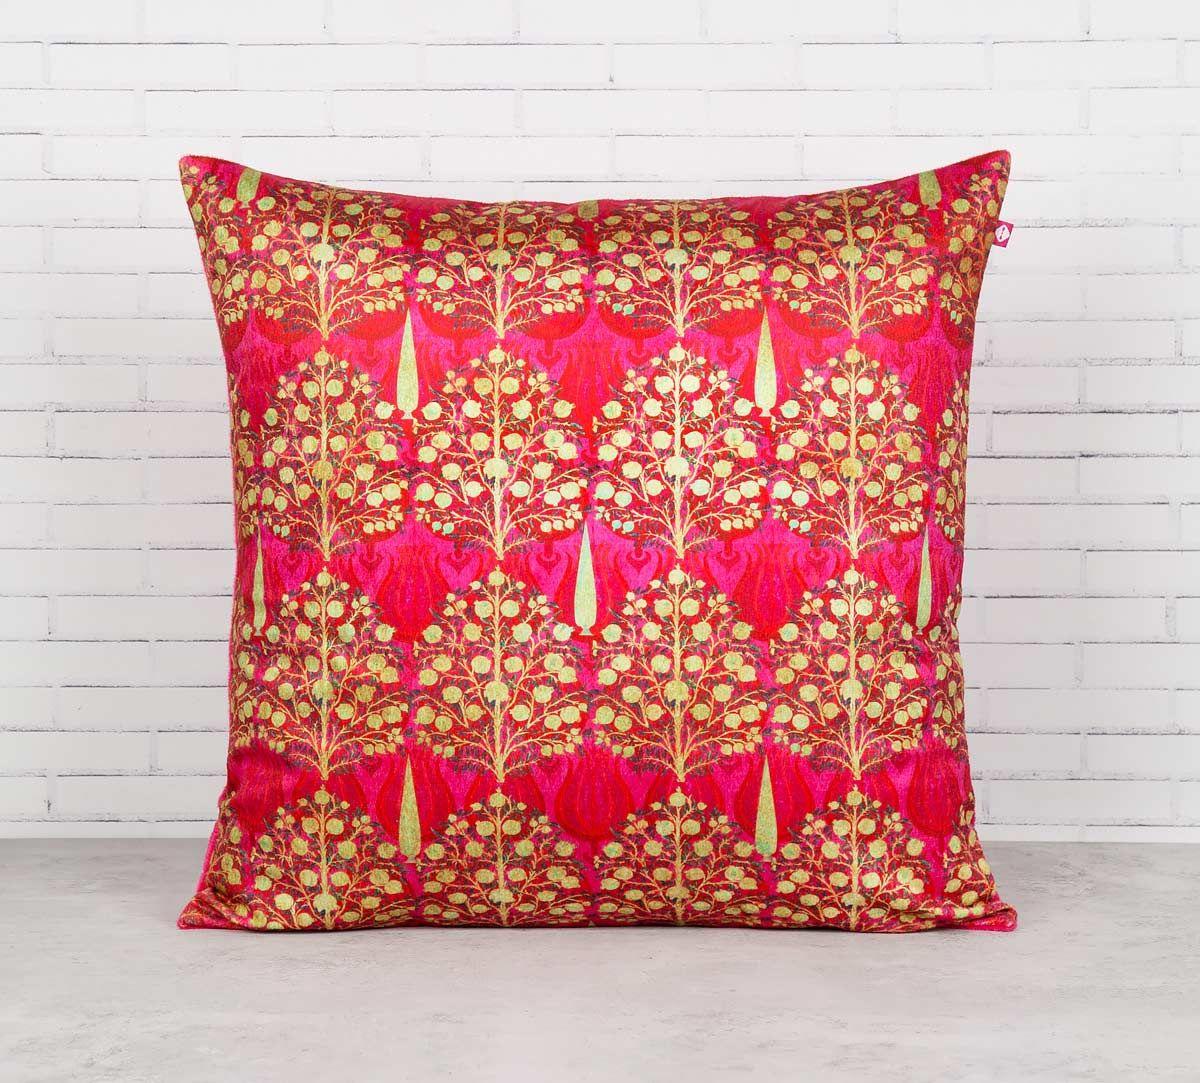 India Circus Mystical Pomegranate Blended Velvet Cushion Cover